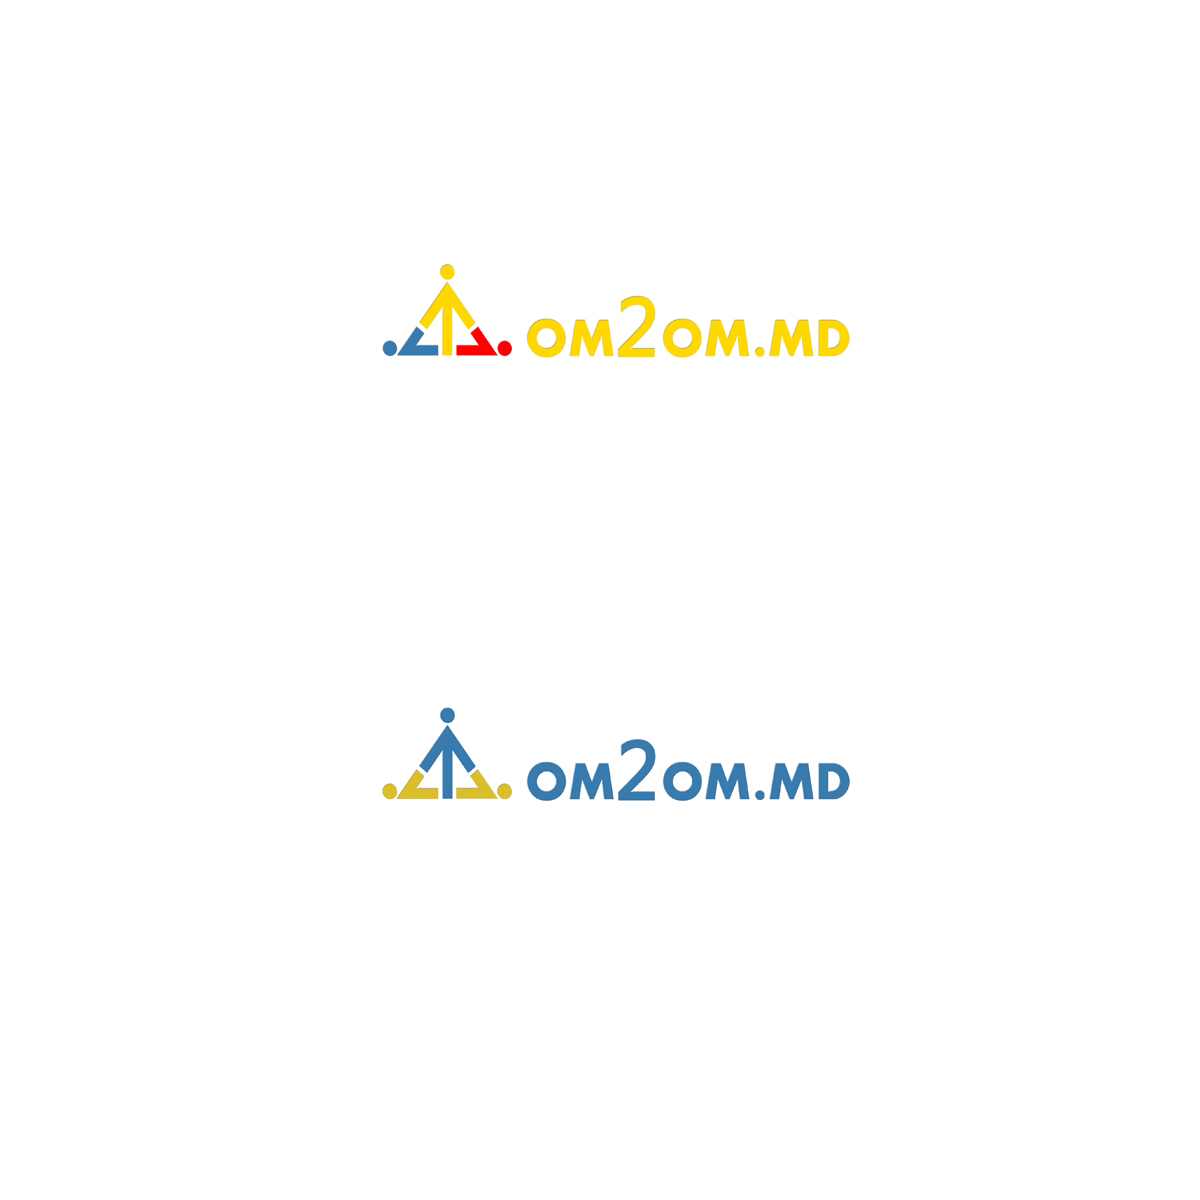 Разработка логотипа для краудфандинговой платформы om2om.md фото f_0625f58b5aa669e5.jpg